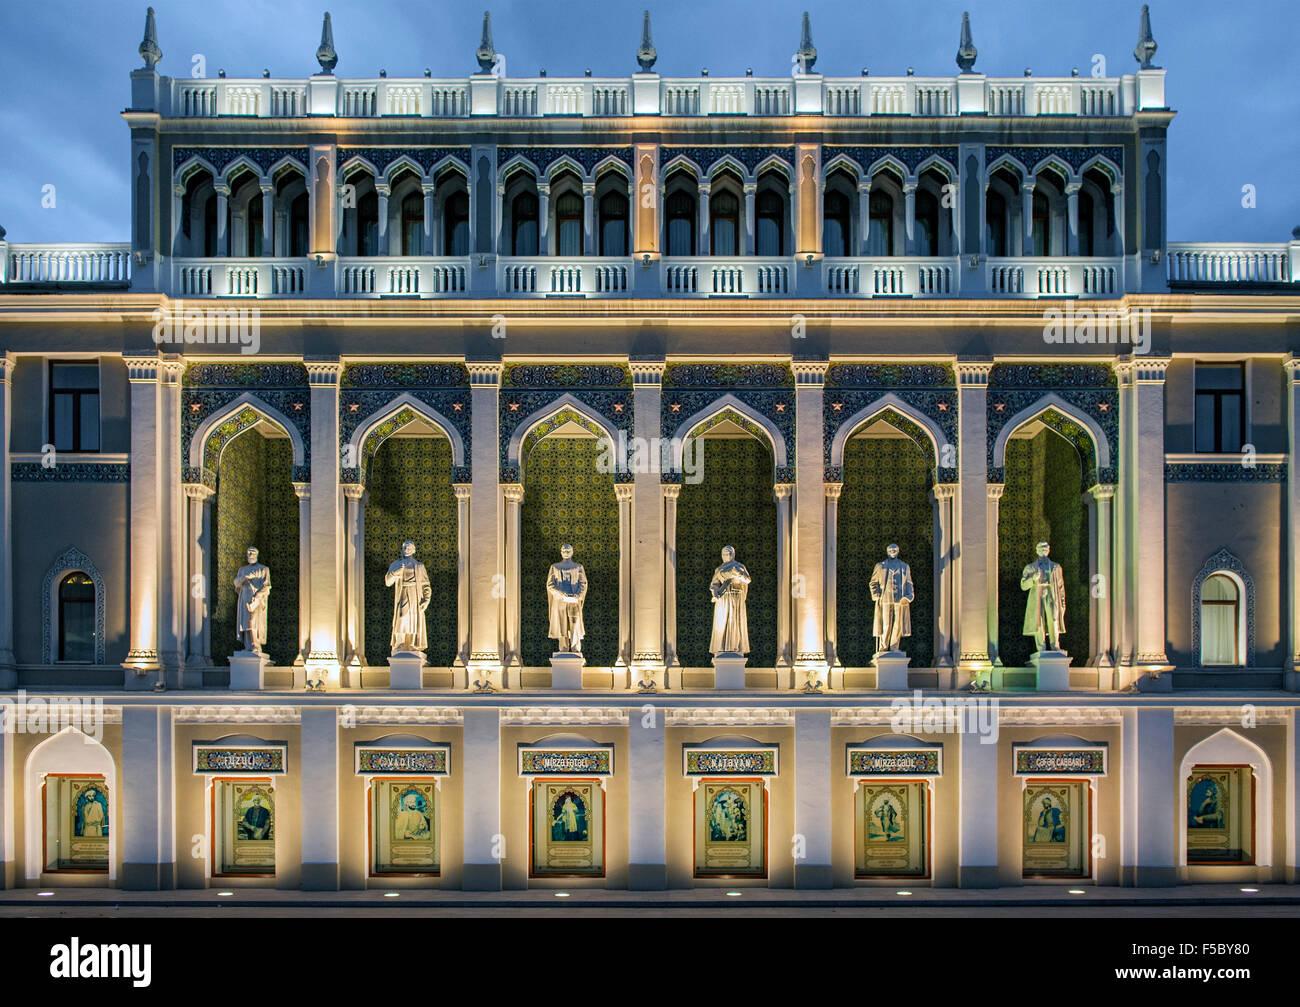 The Nizami Museum of Azerbaijan Literature in Baku. The statues are of famous Azeri writers. - Stock Image